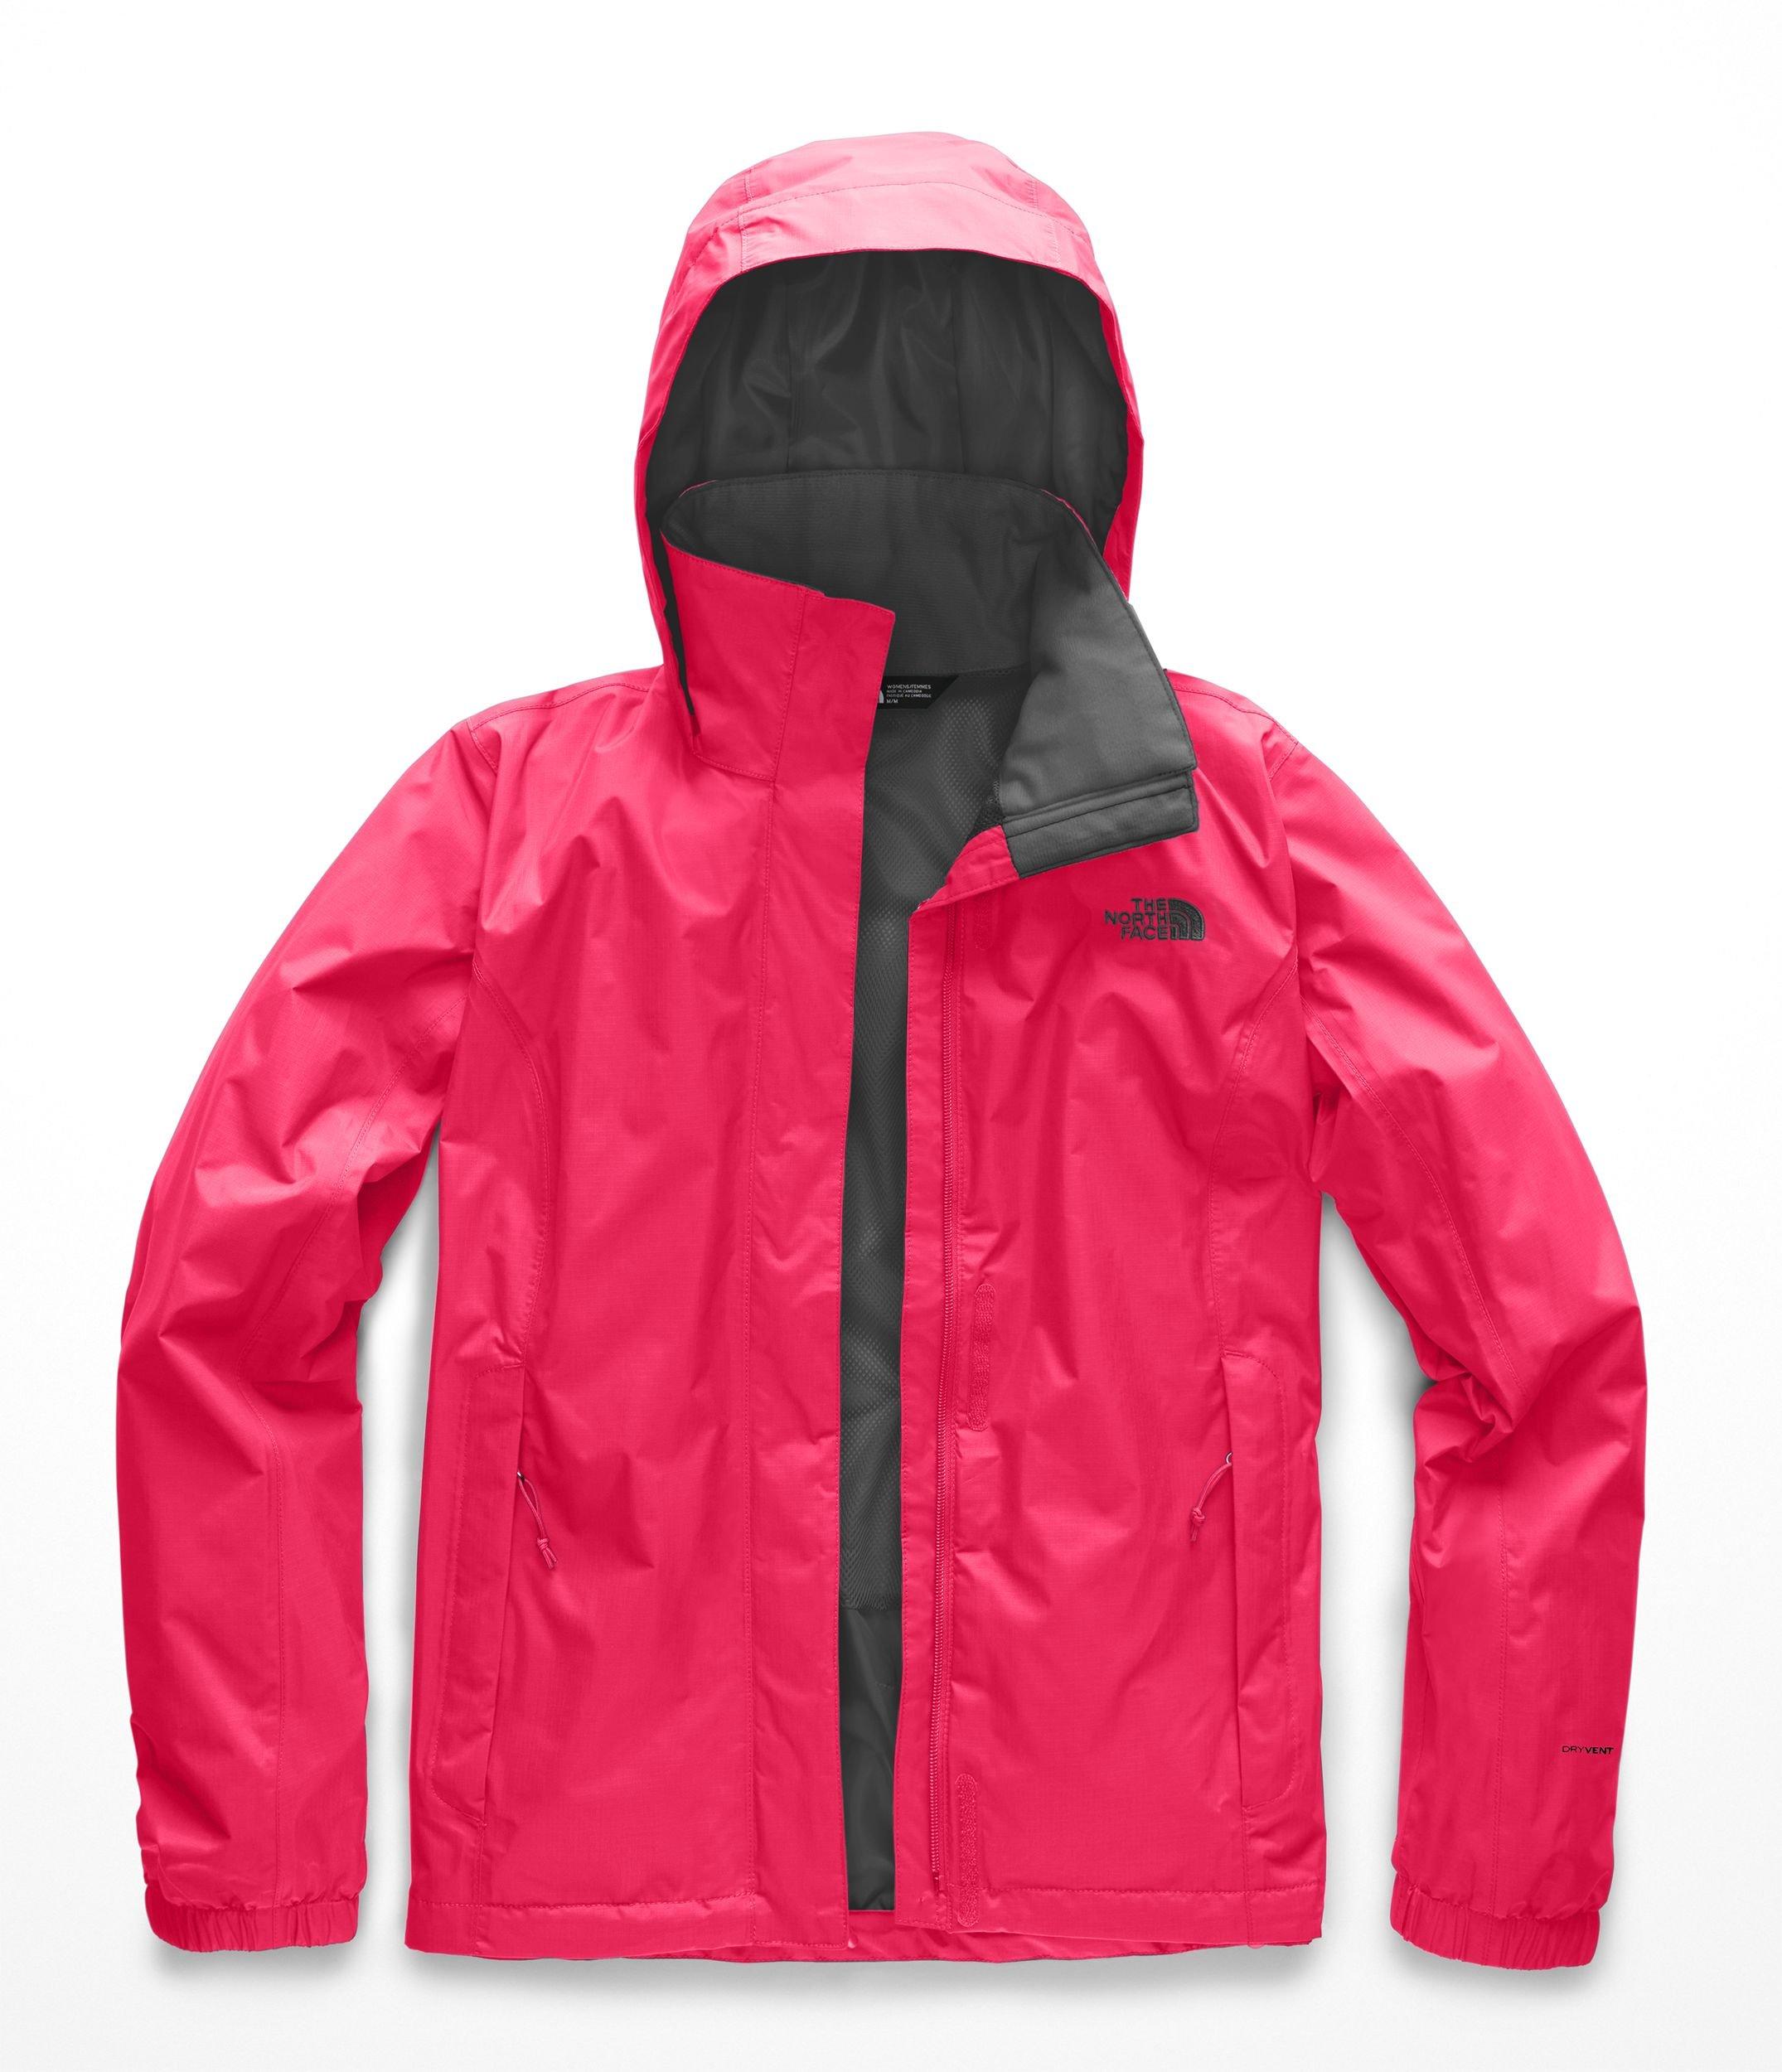 The North Face Women Resolve 2 Jacket - Atomic Pink & Asphalt Grey - M